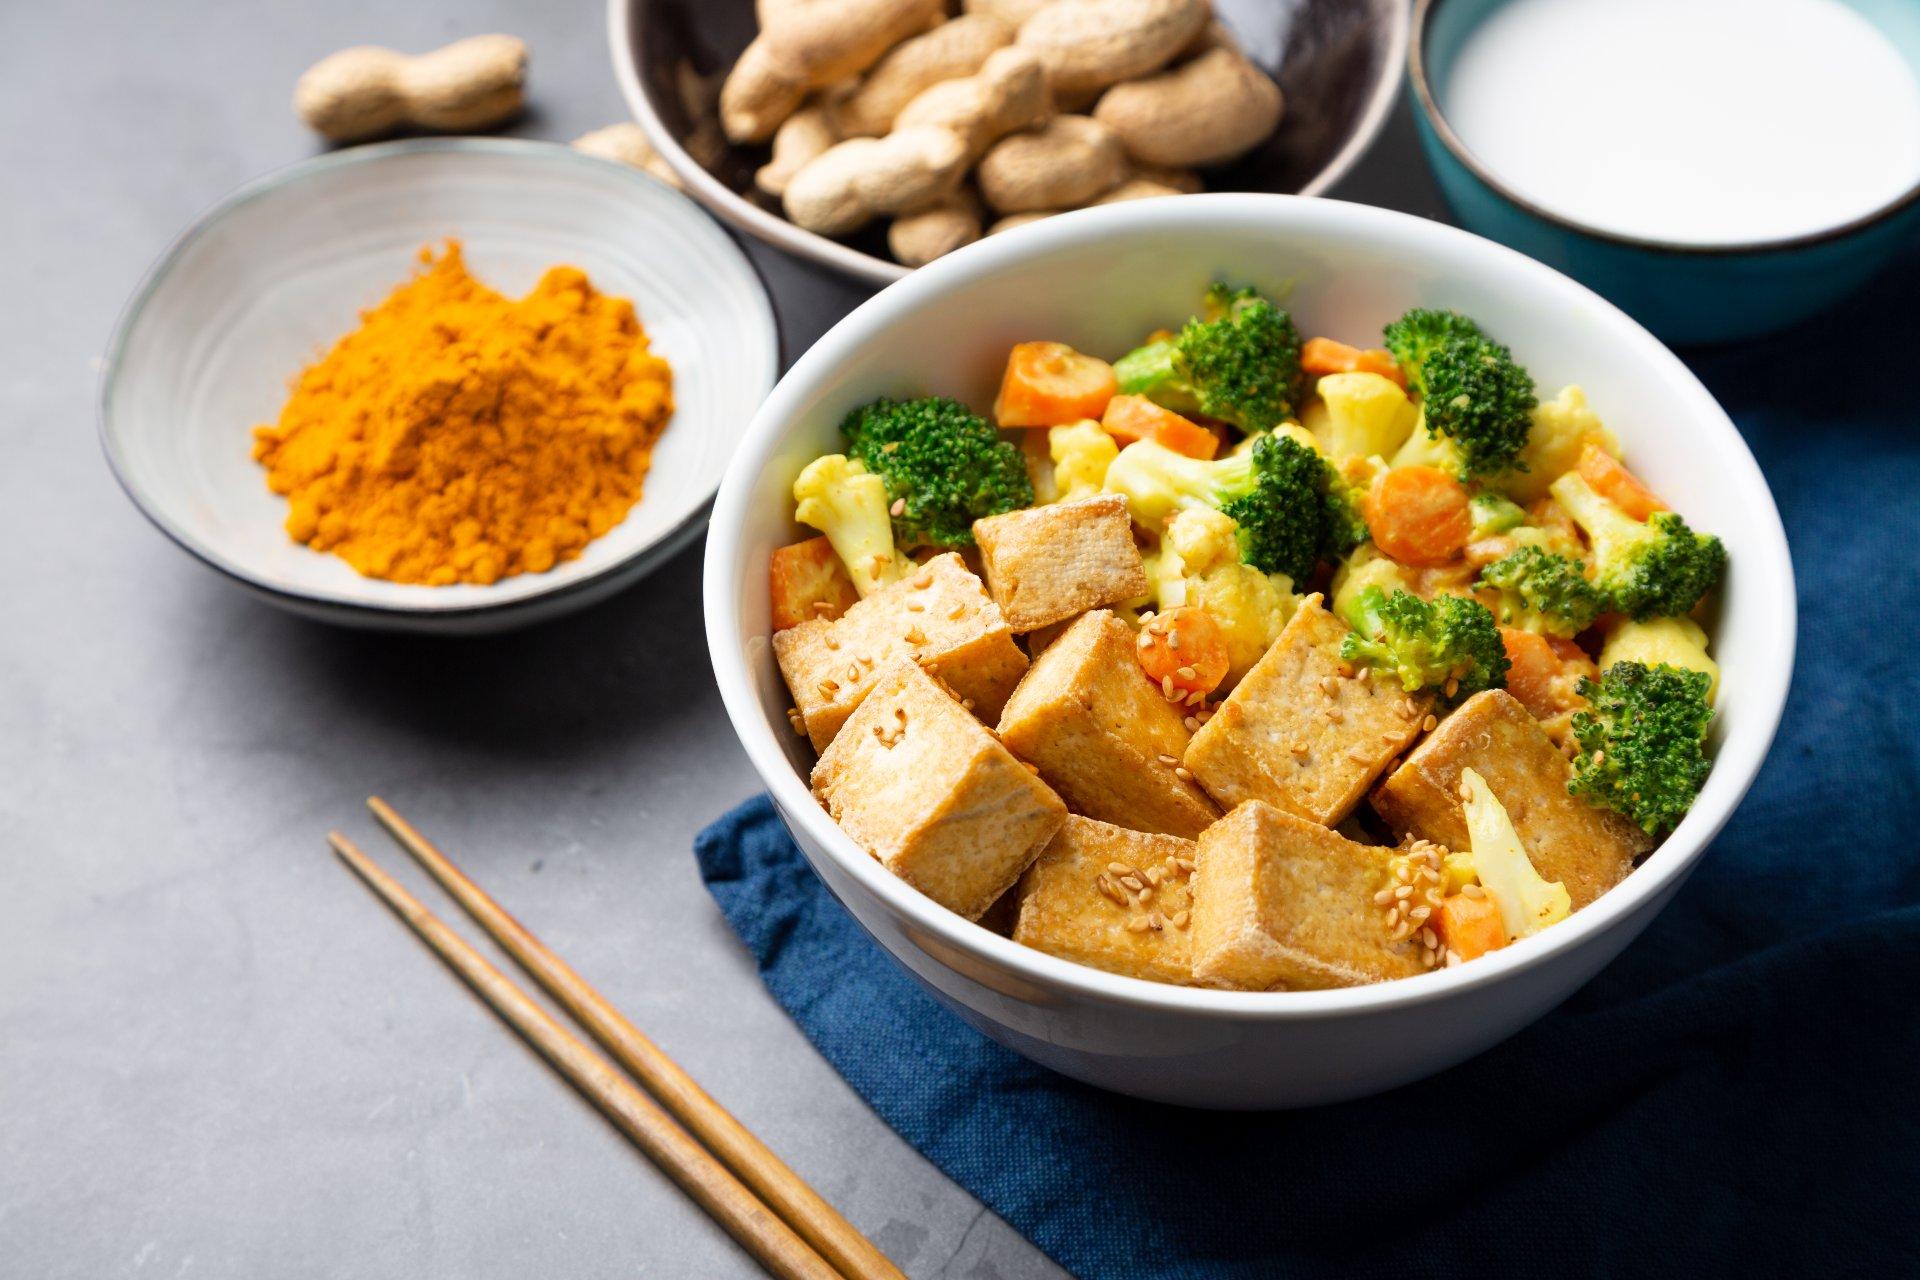 vegetarian-meal-tofu-broccoli-curry